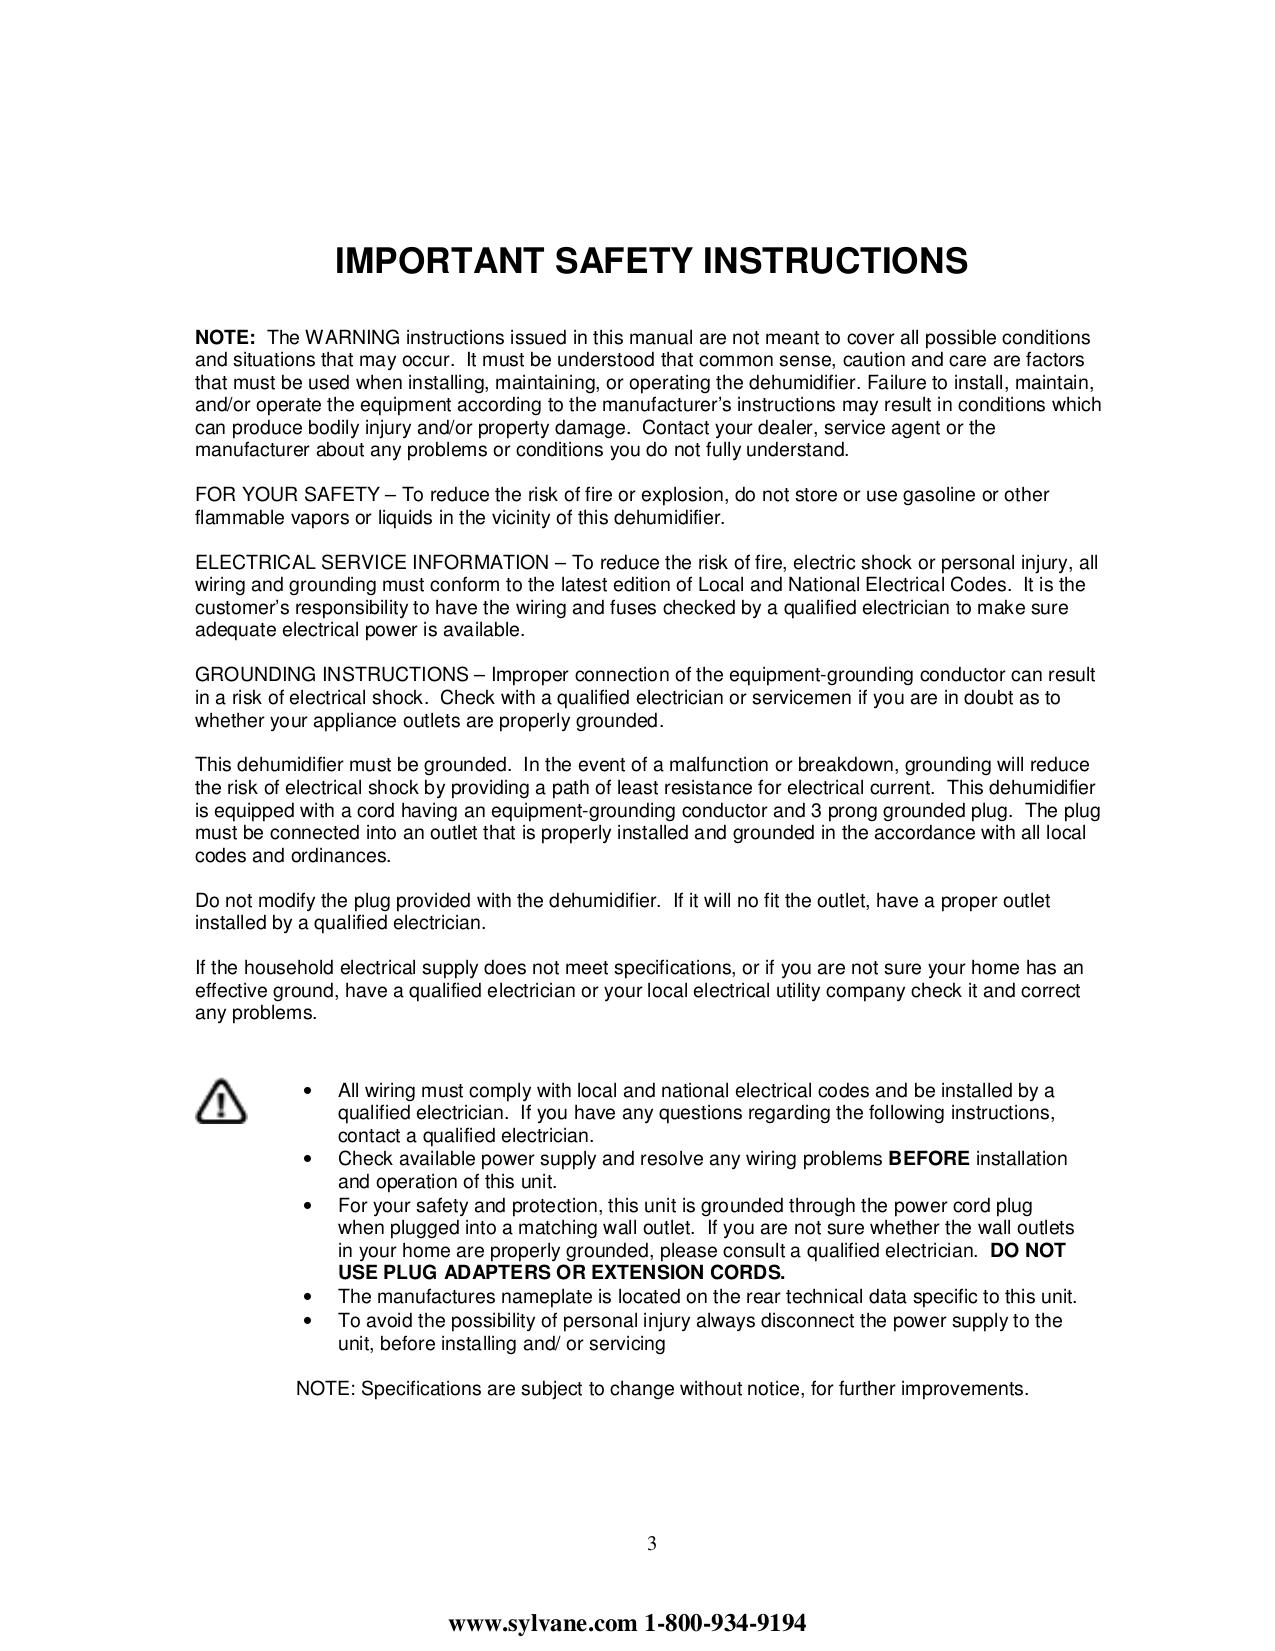 PDF manual for Soleus Dehumidifier CFM-40E